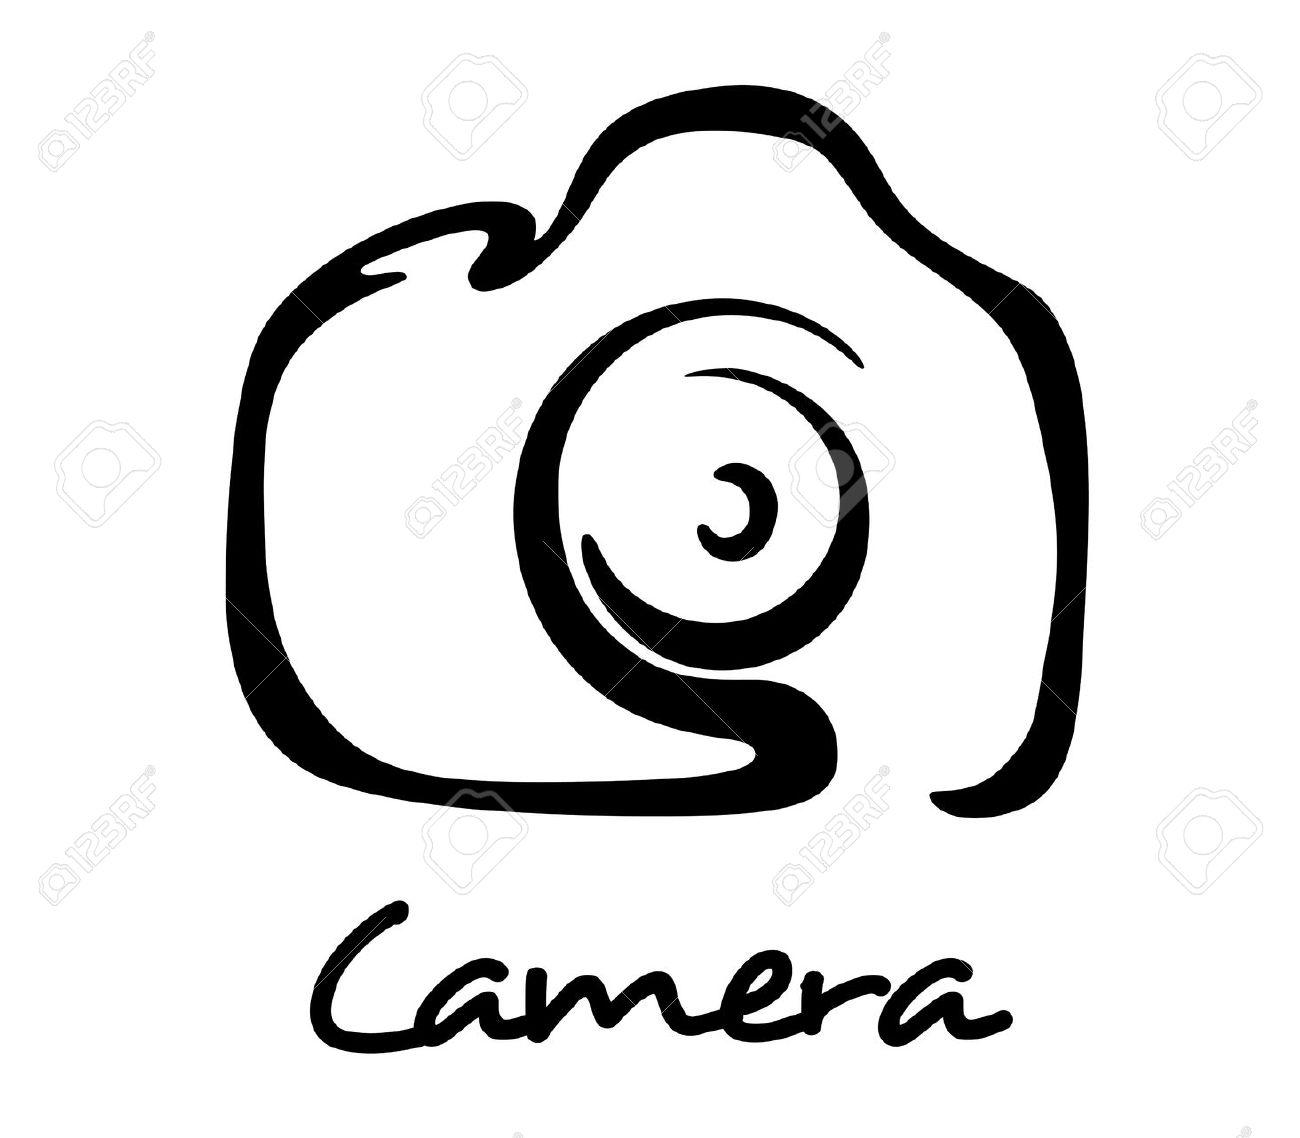 14 dslr camera in psd logo images digital camera logos